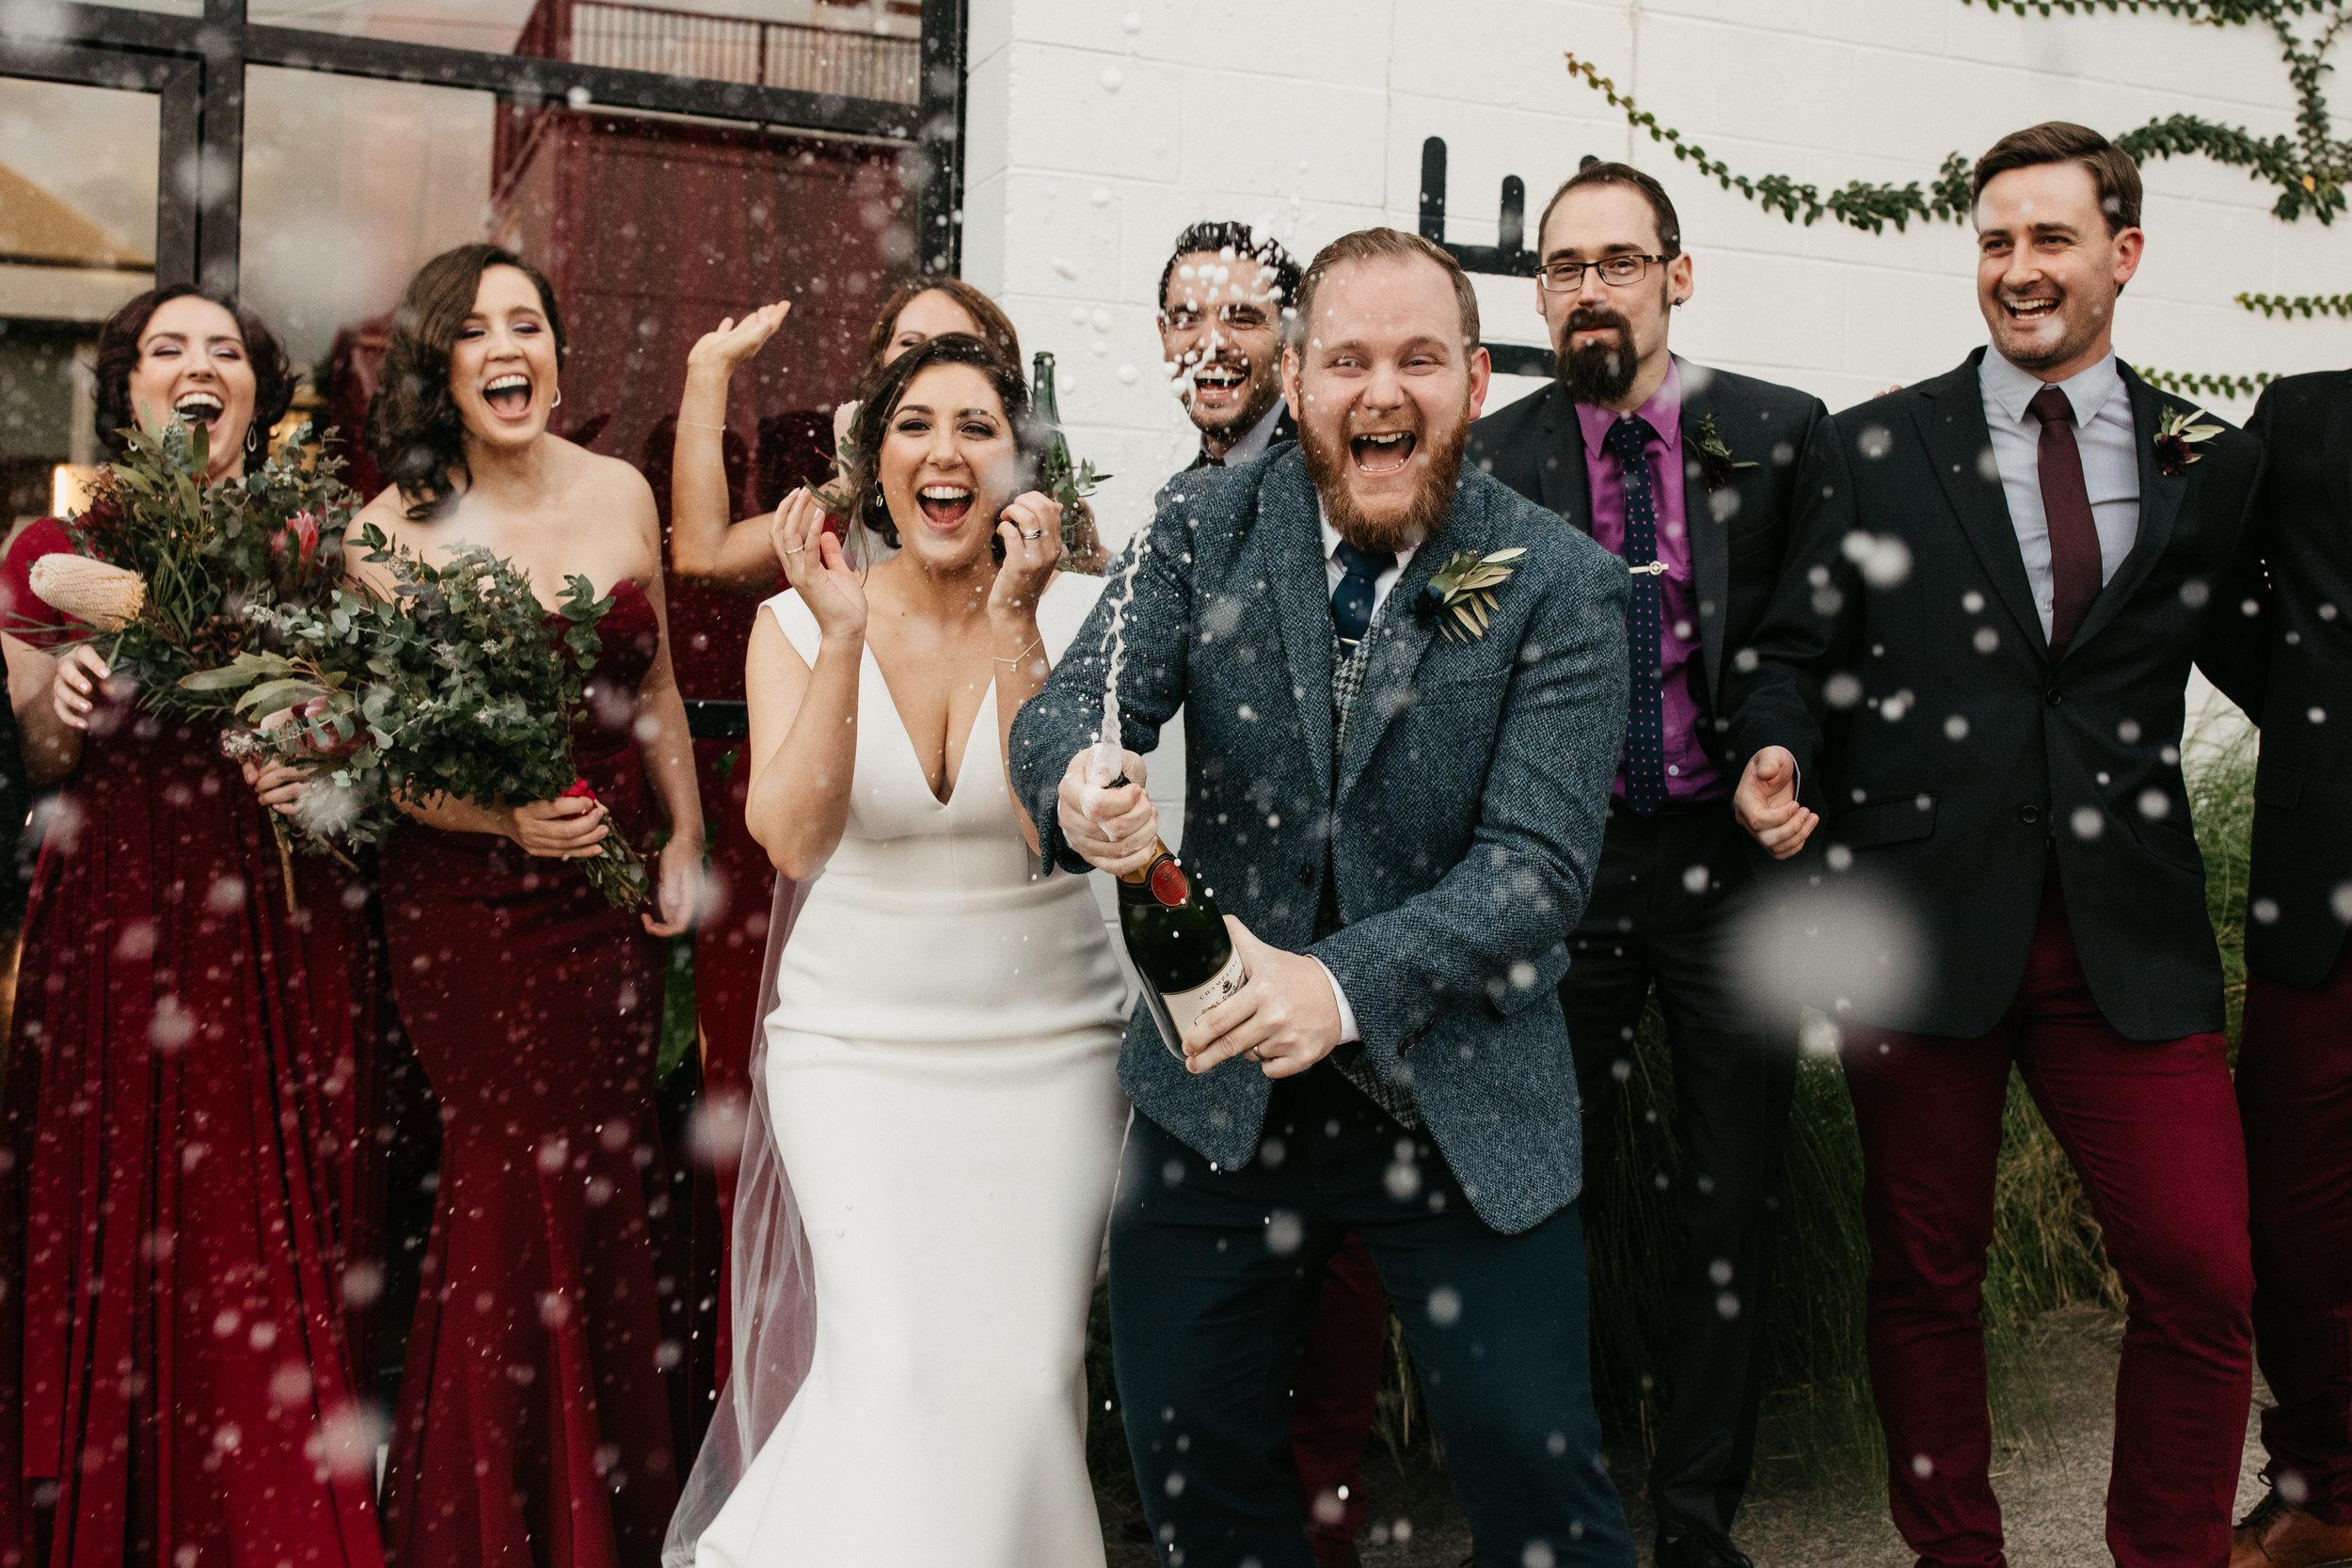 SBA-Larry-Chelsea-Wedding-397.jpg